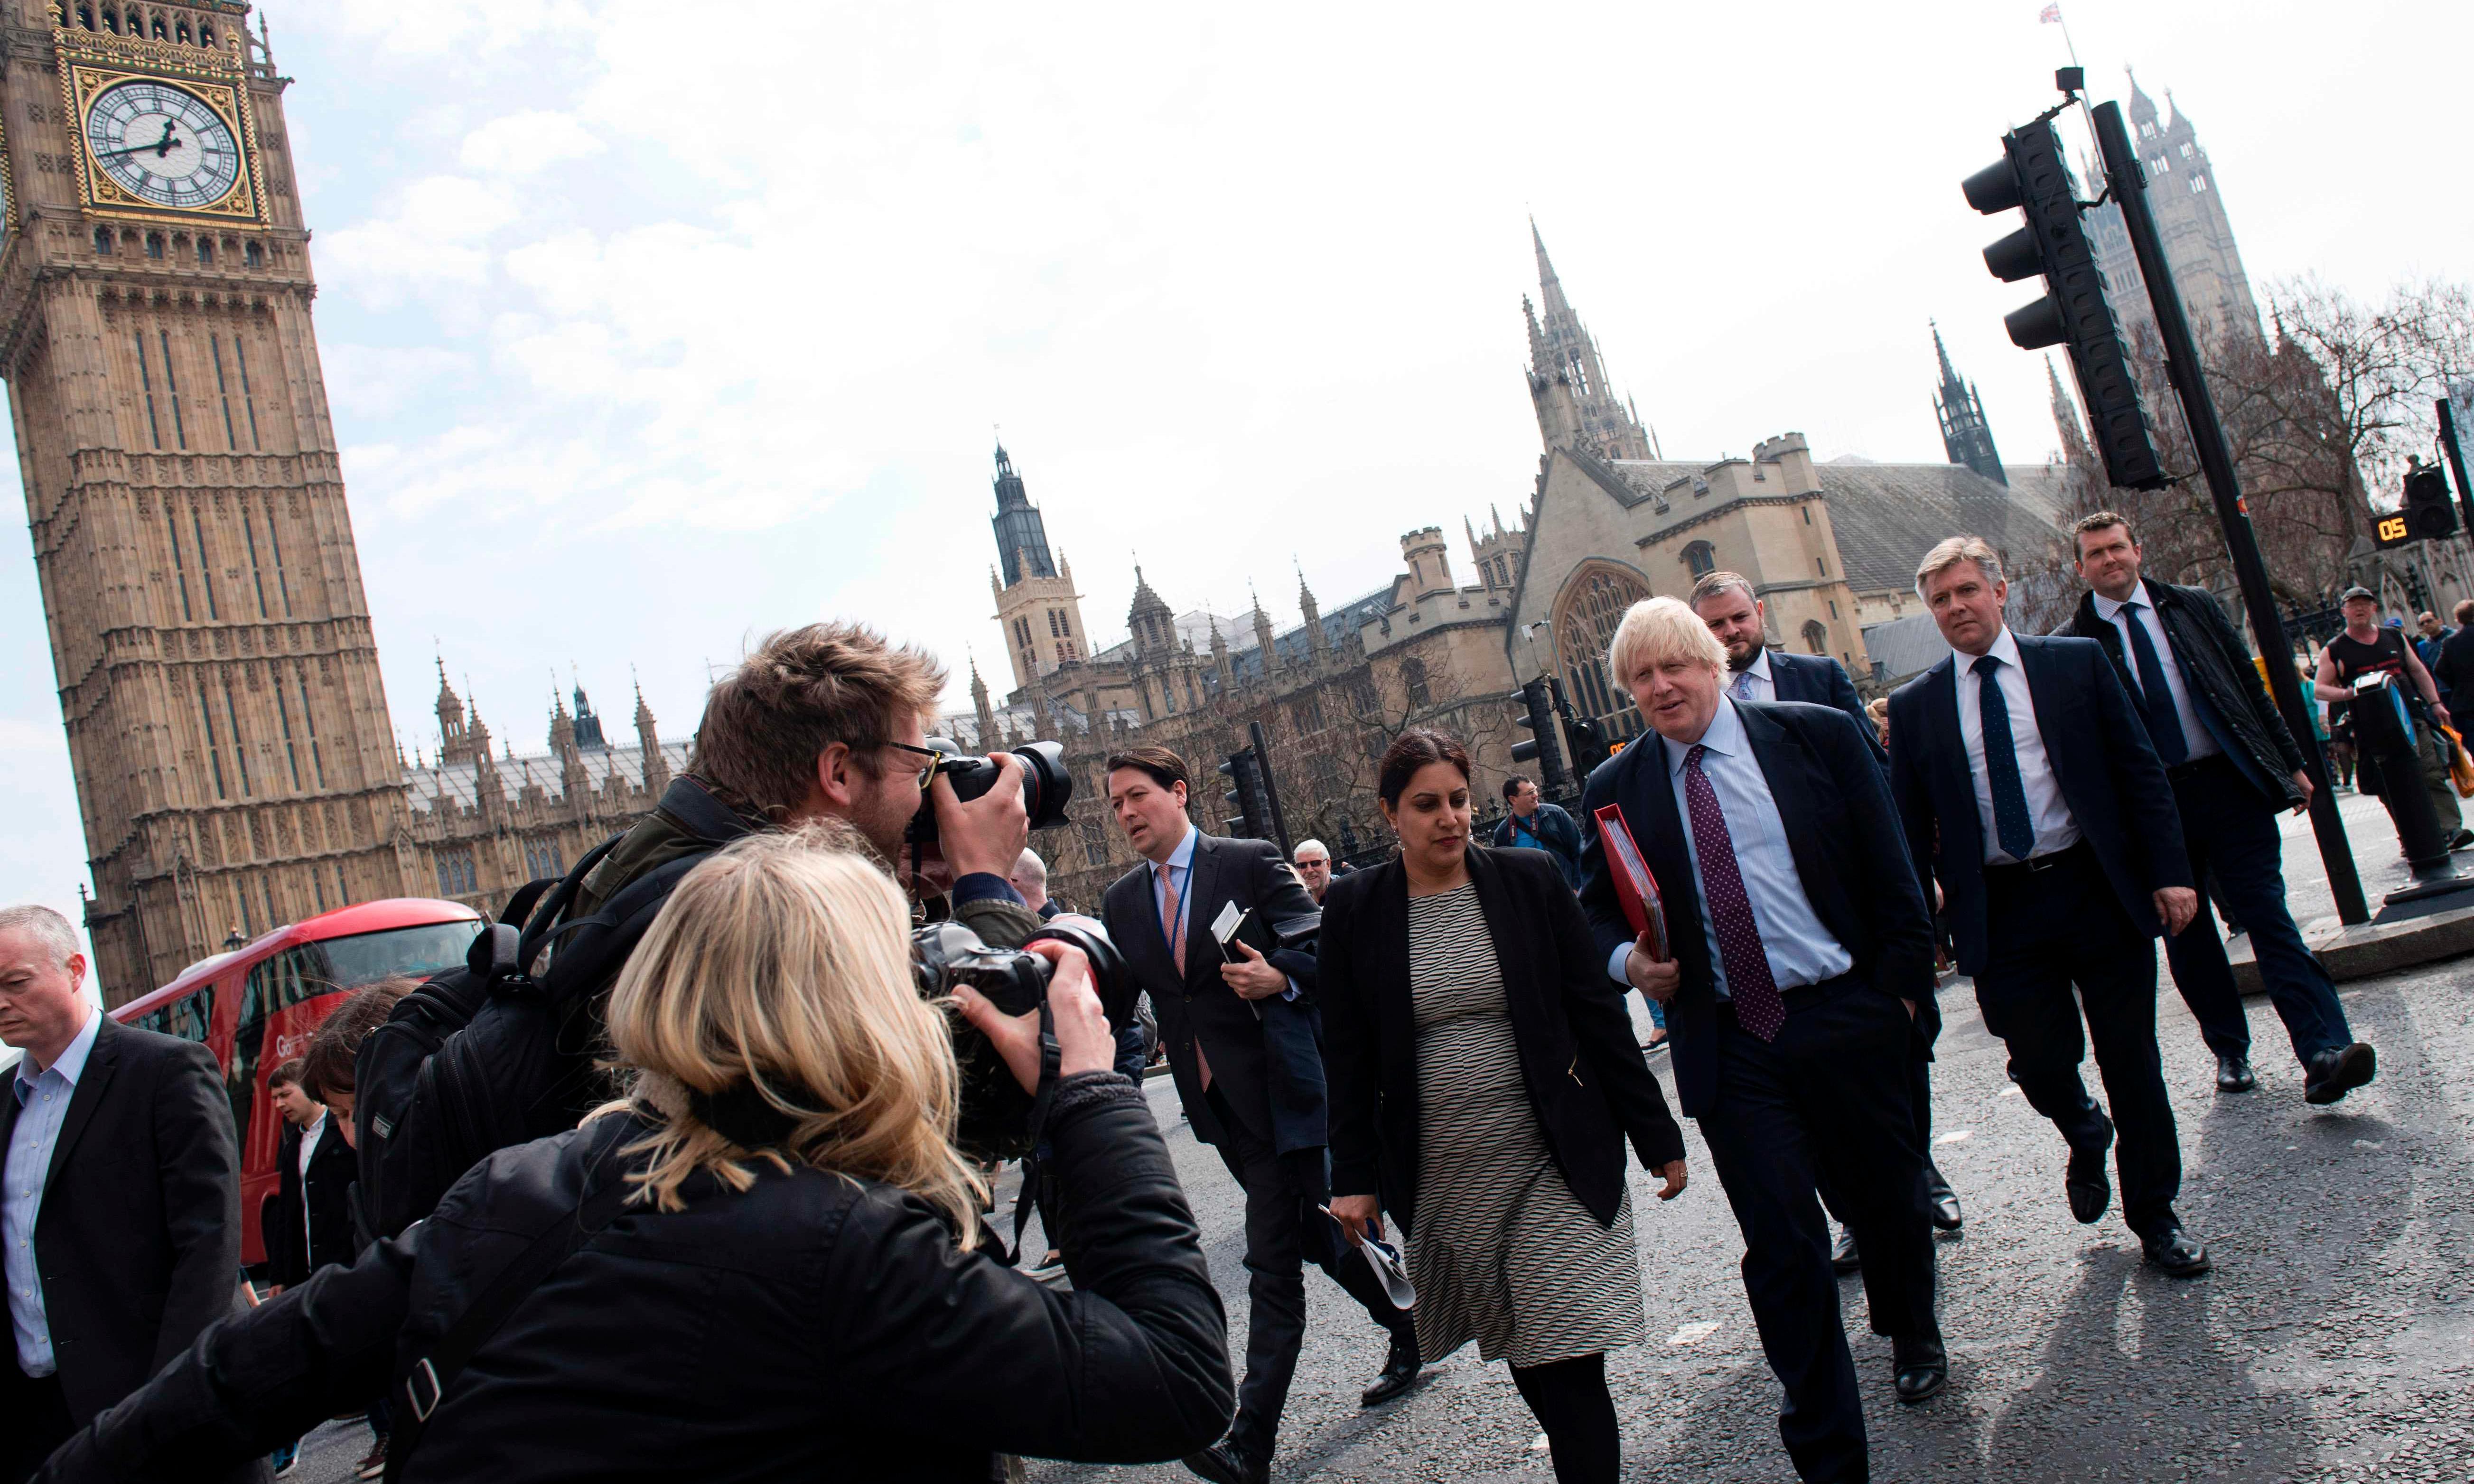 Boris Johnson's Big Ben Brexit bong plan falls flat